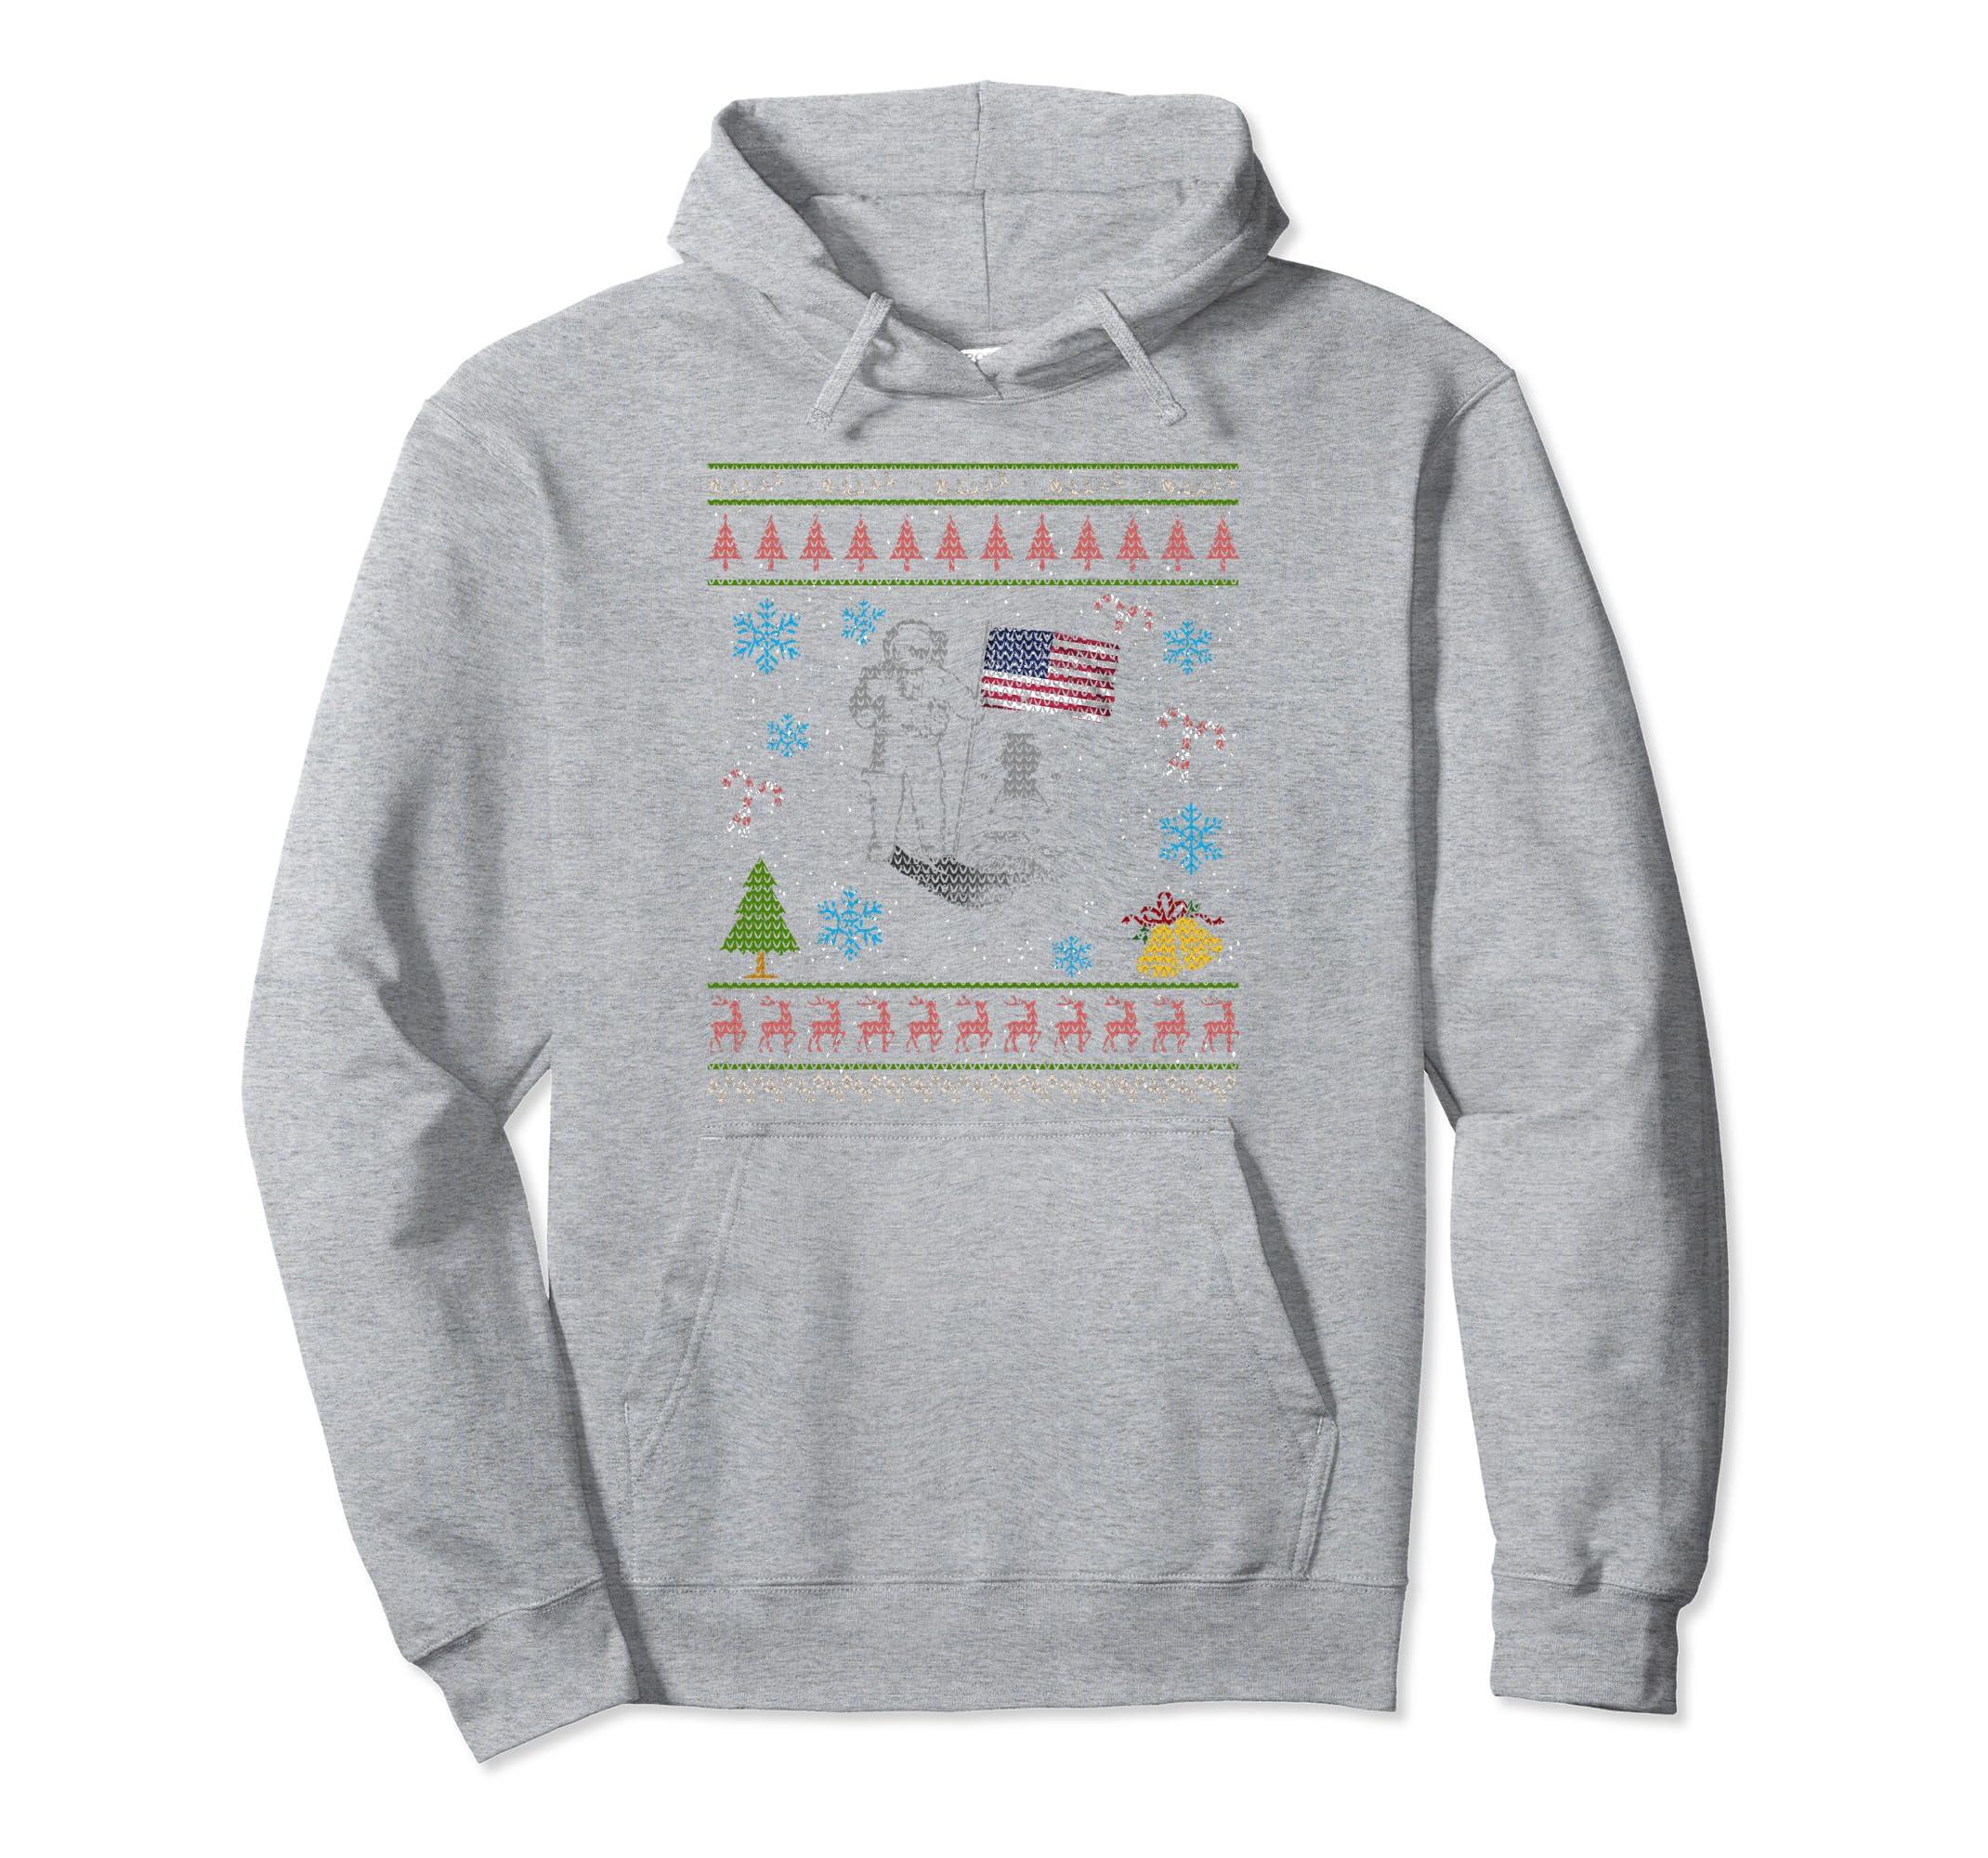 Hoodie Ugly Christmas Sweater Space Moon Man